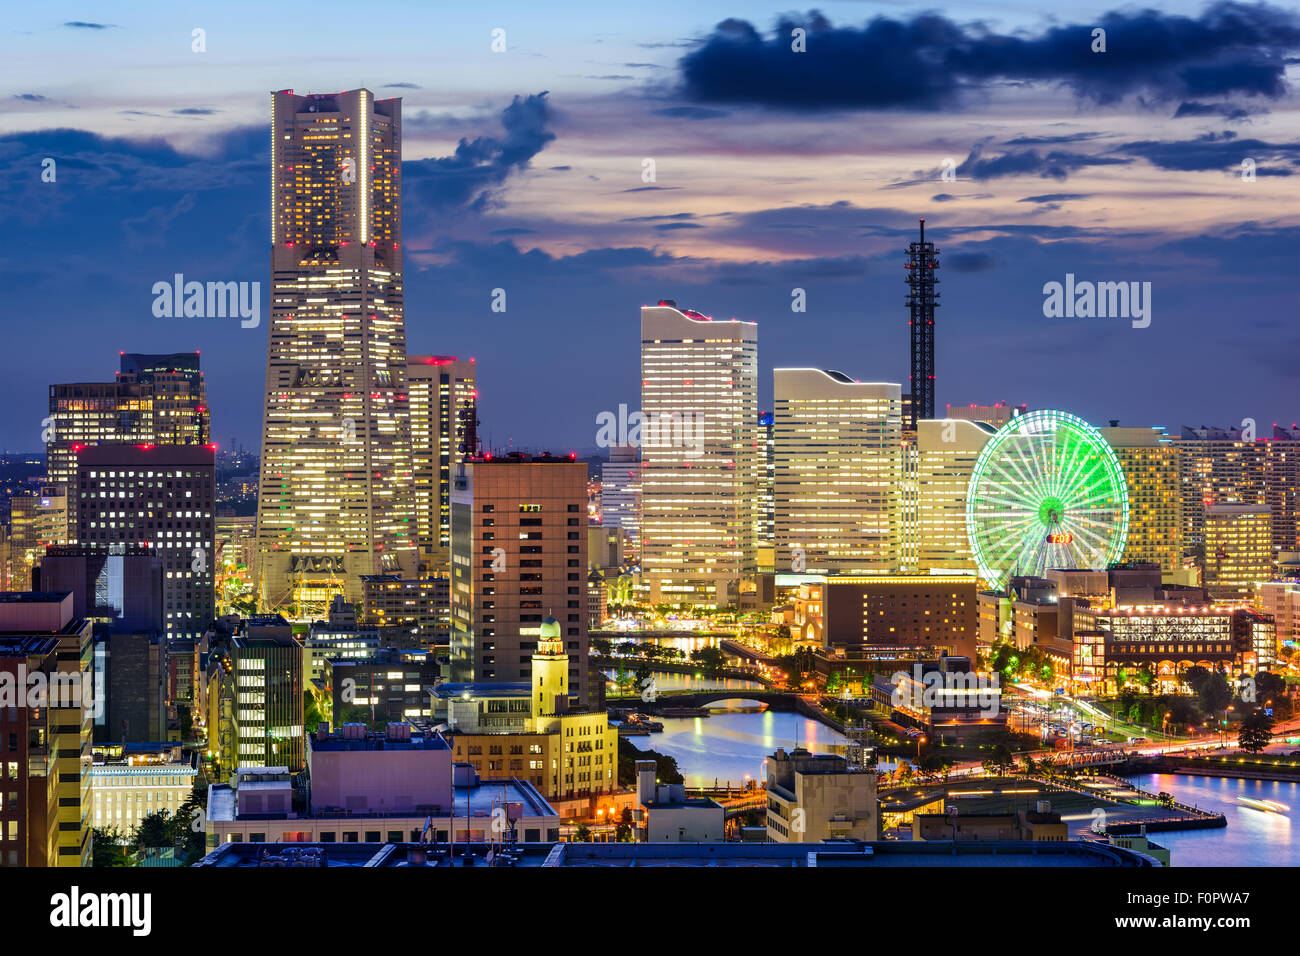 Yokohama, Japan skyline at dusk. - Stock Image